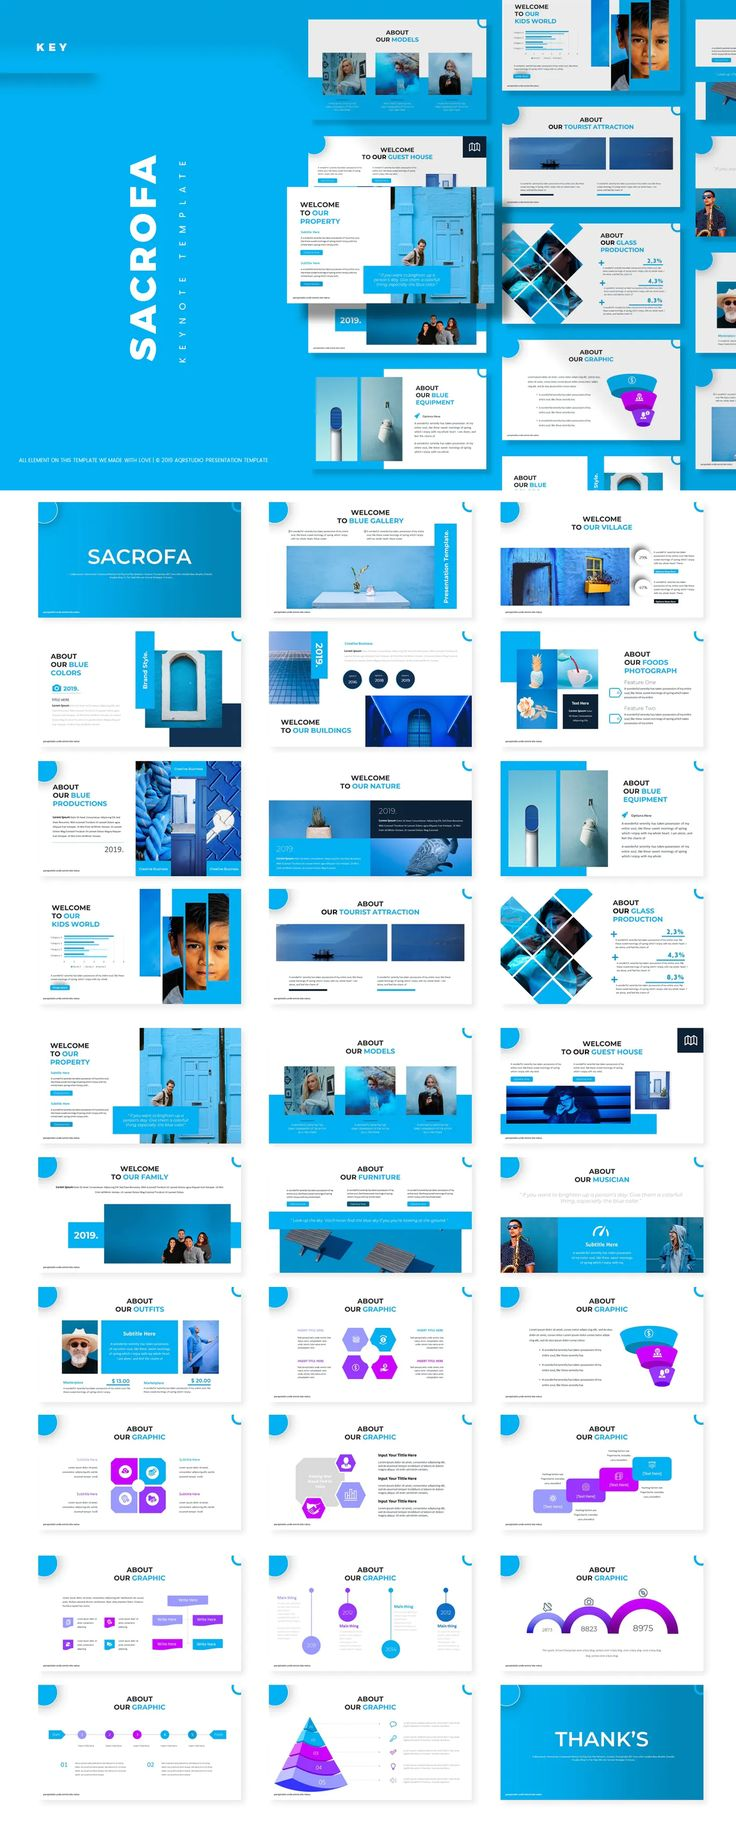 Sacrofa - Keynote Presentation Template